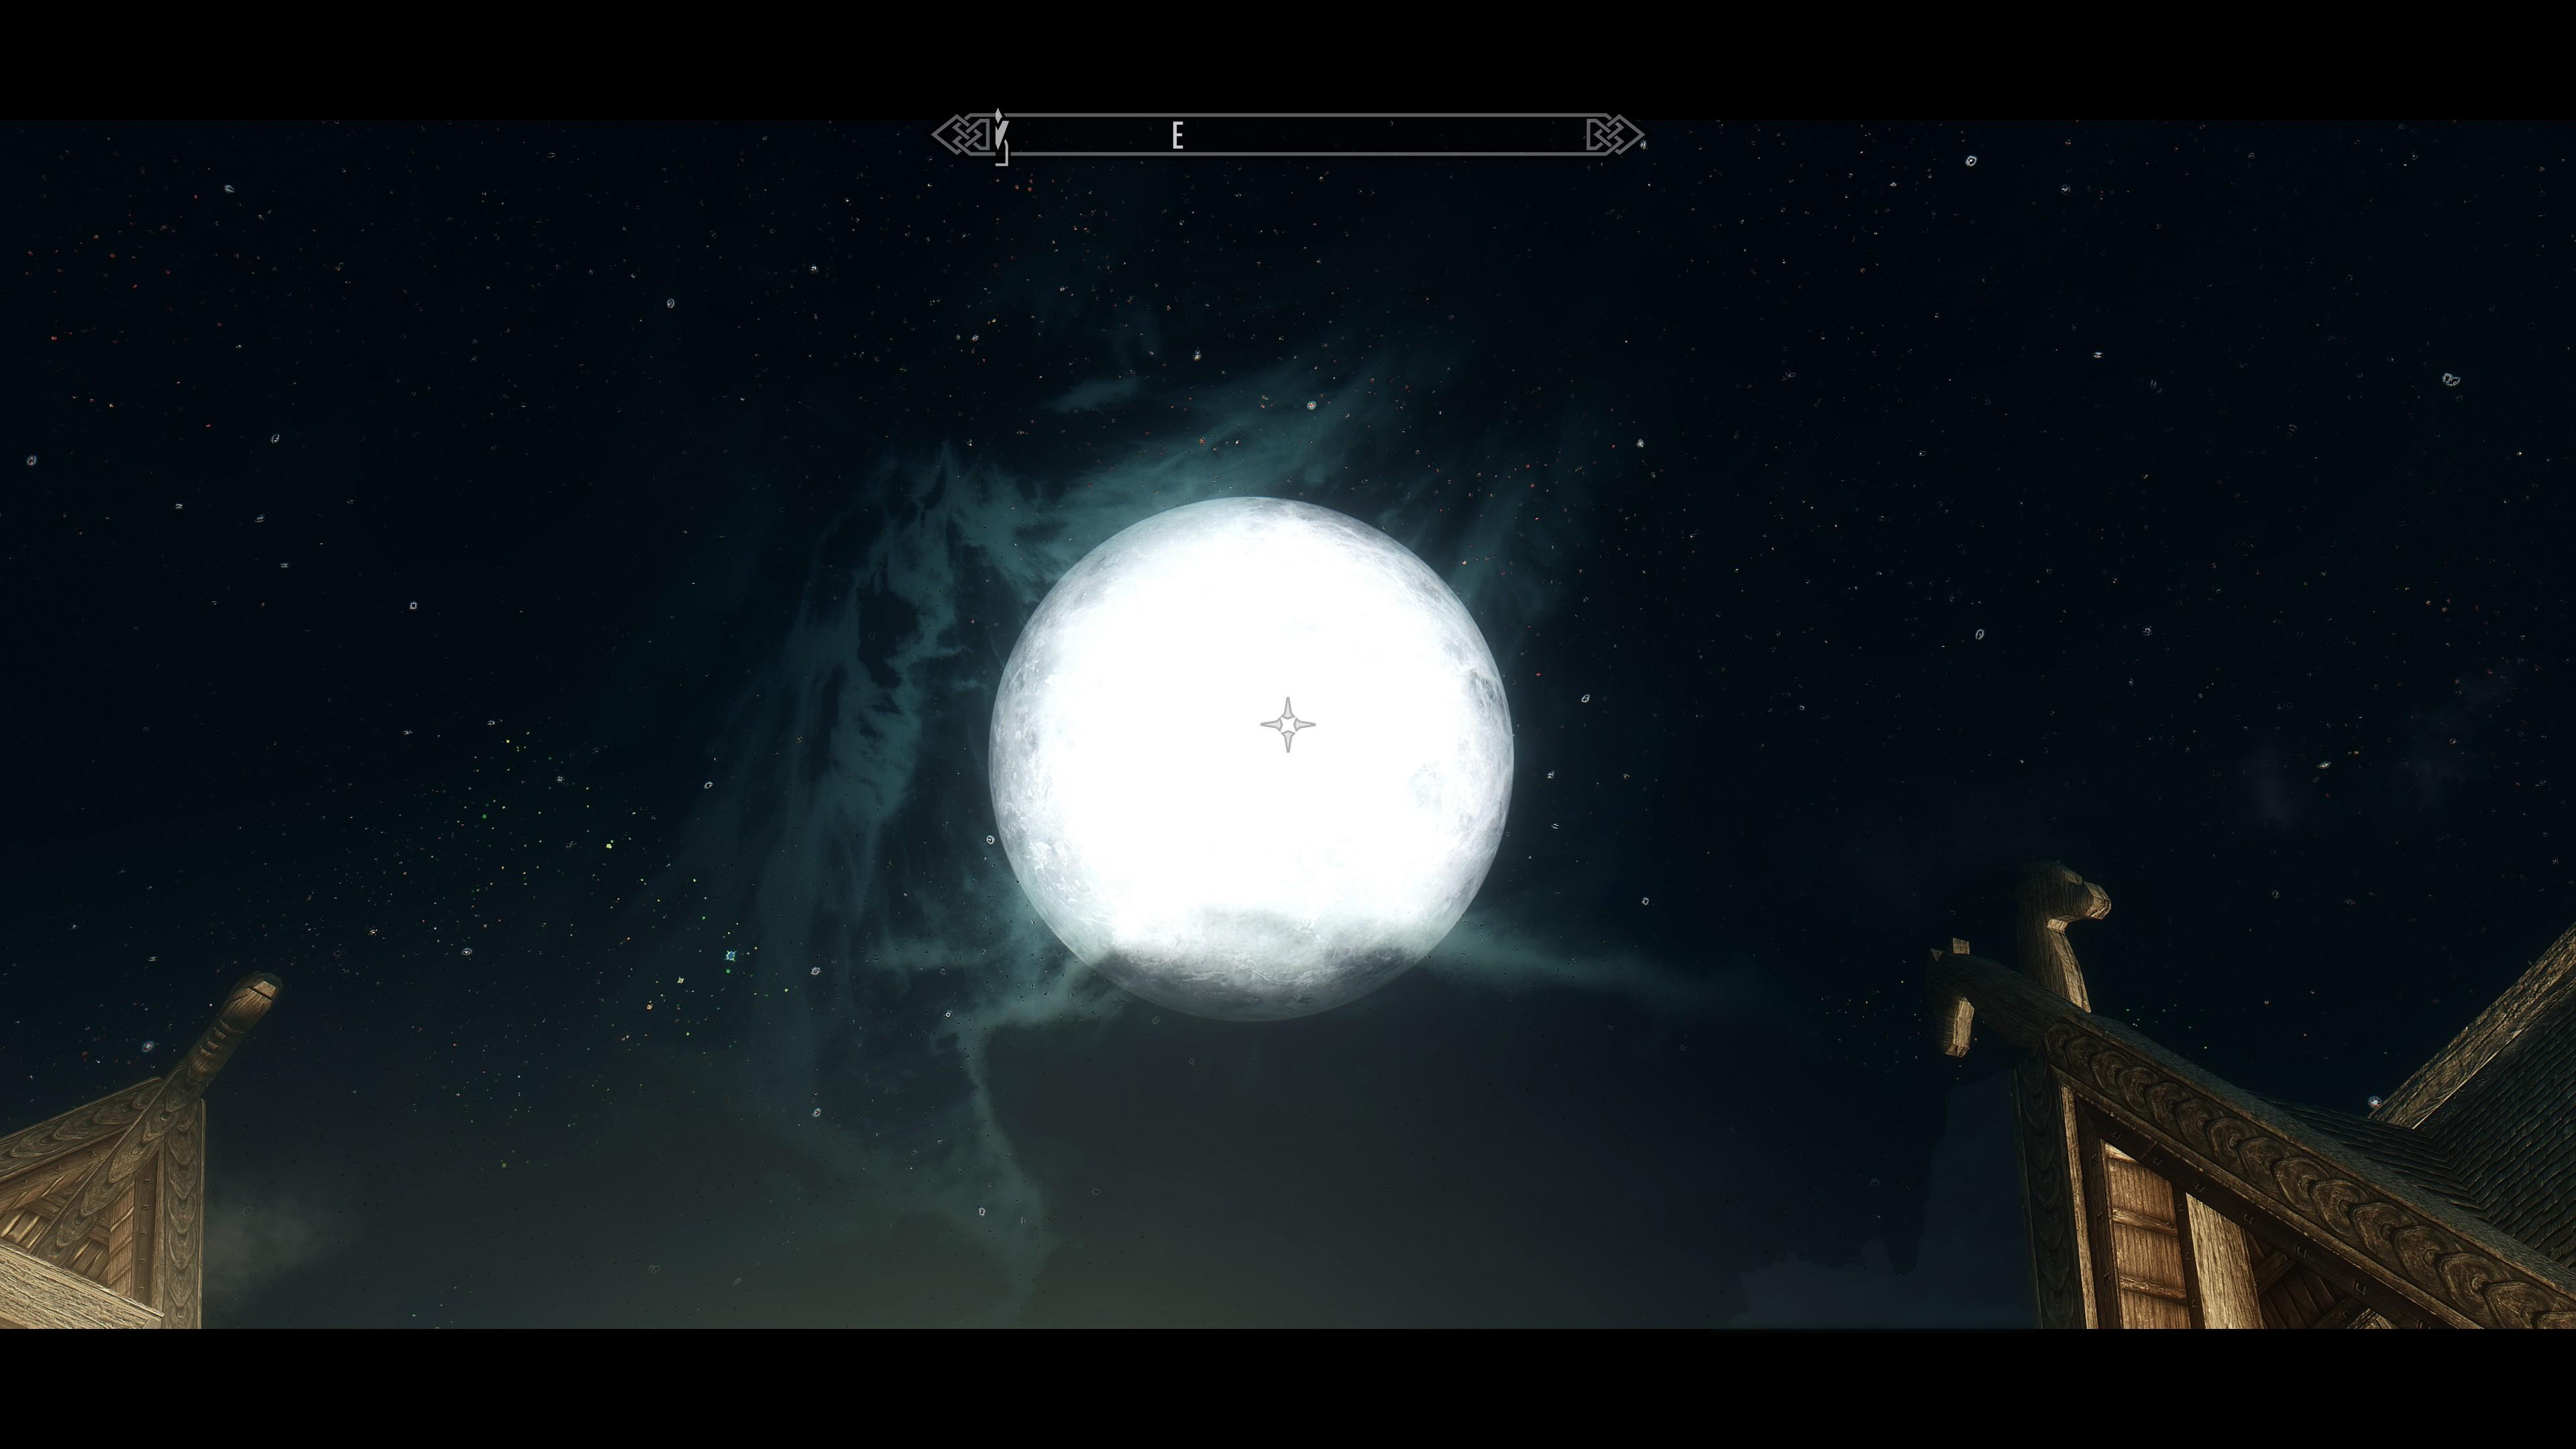 20191207034008_1.jpg - The Elder Scrolls 5: Skyrim